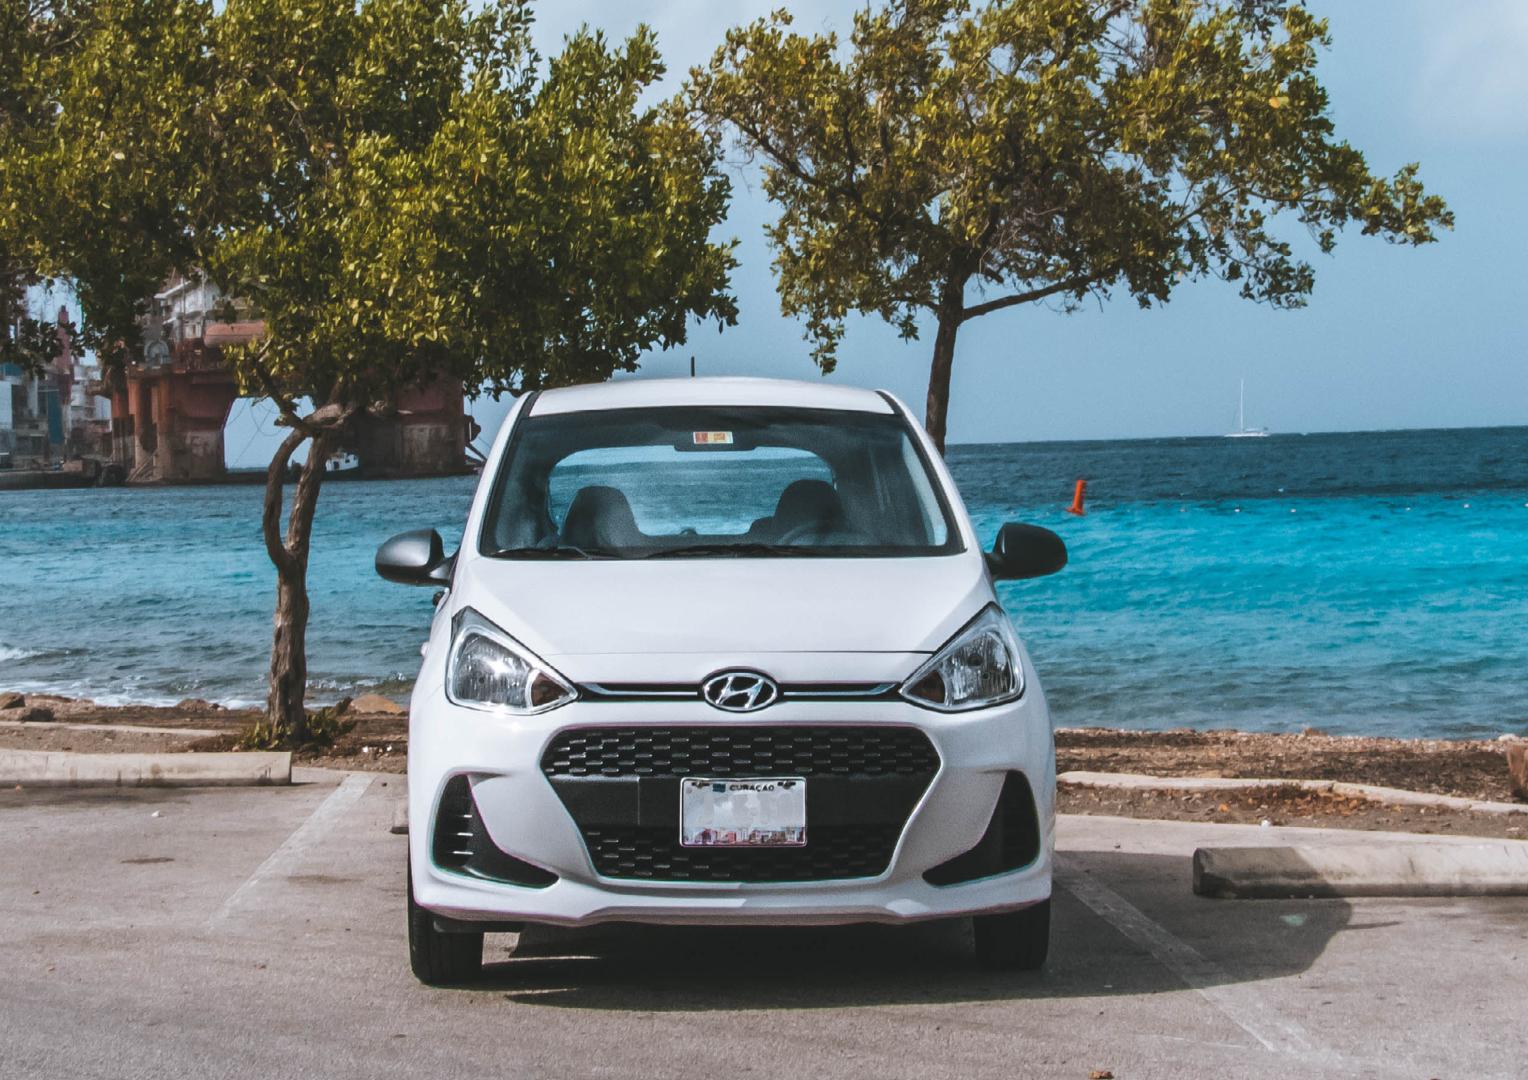 Hyundai i10 Grande